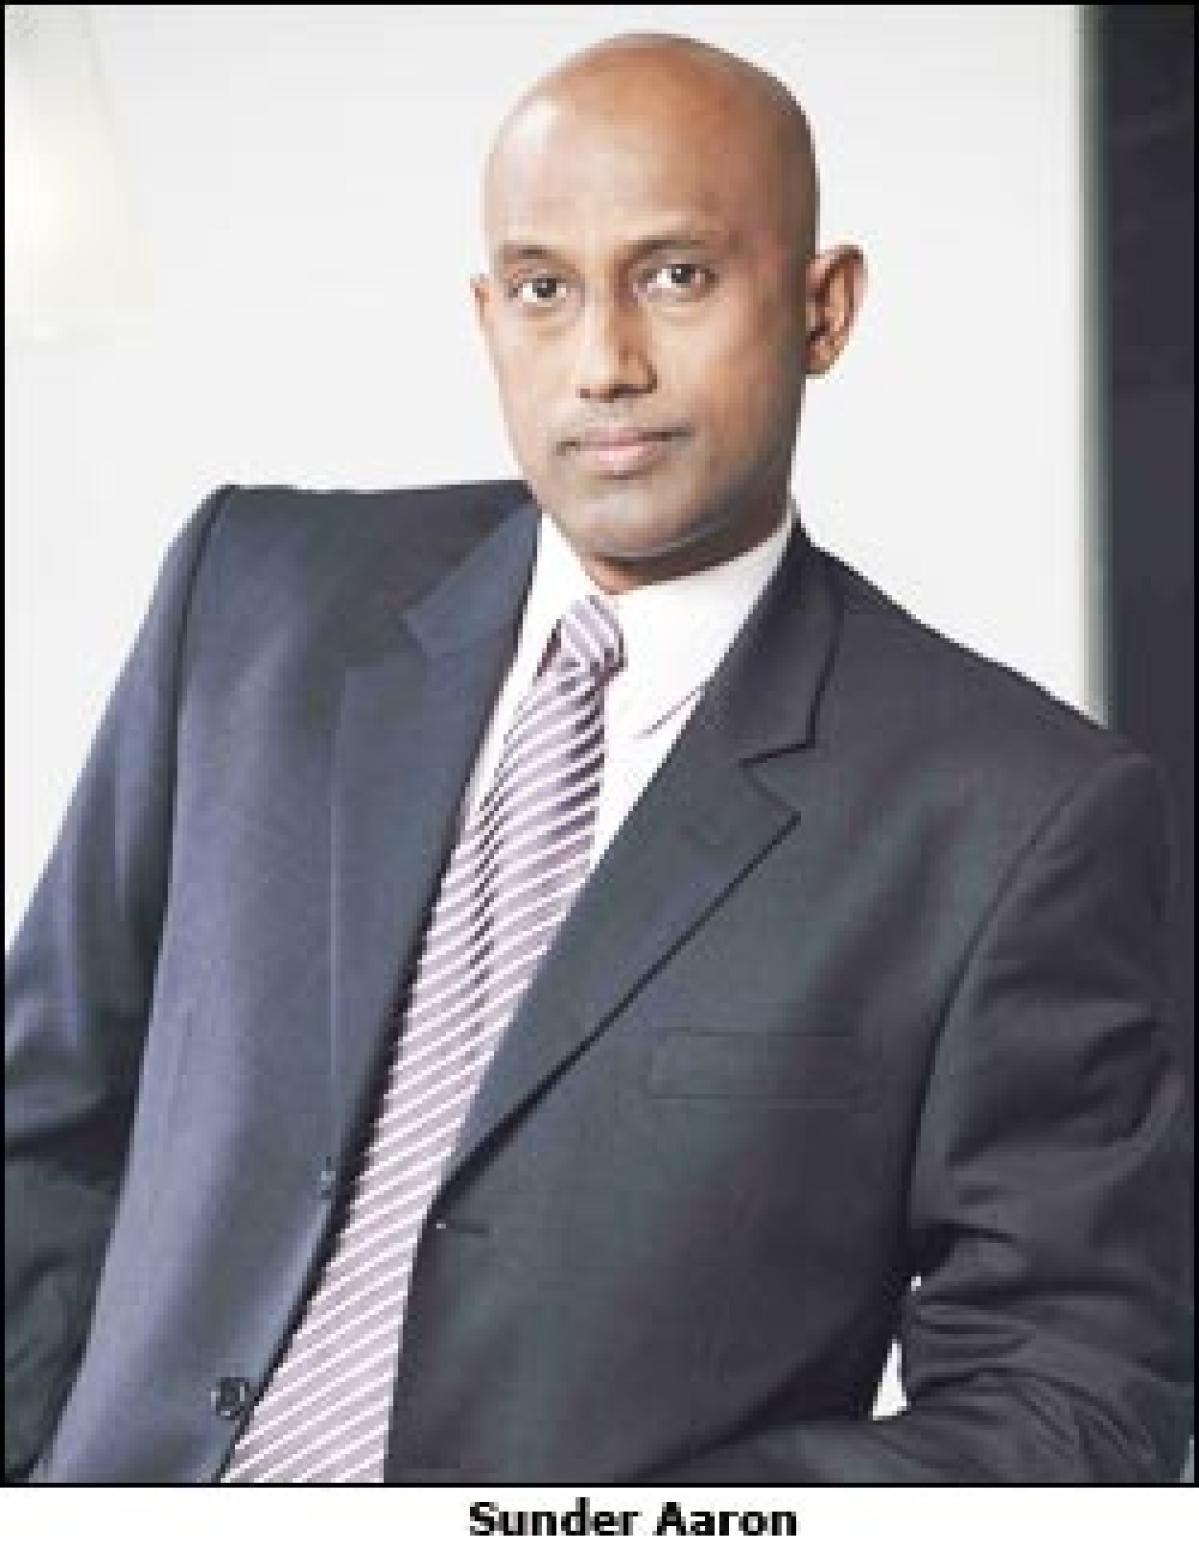 Sunder Aaron quits Pix